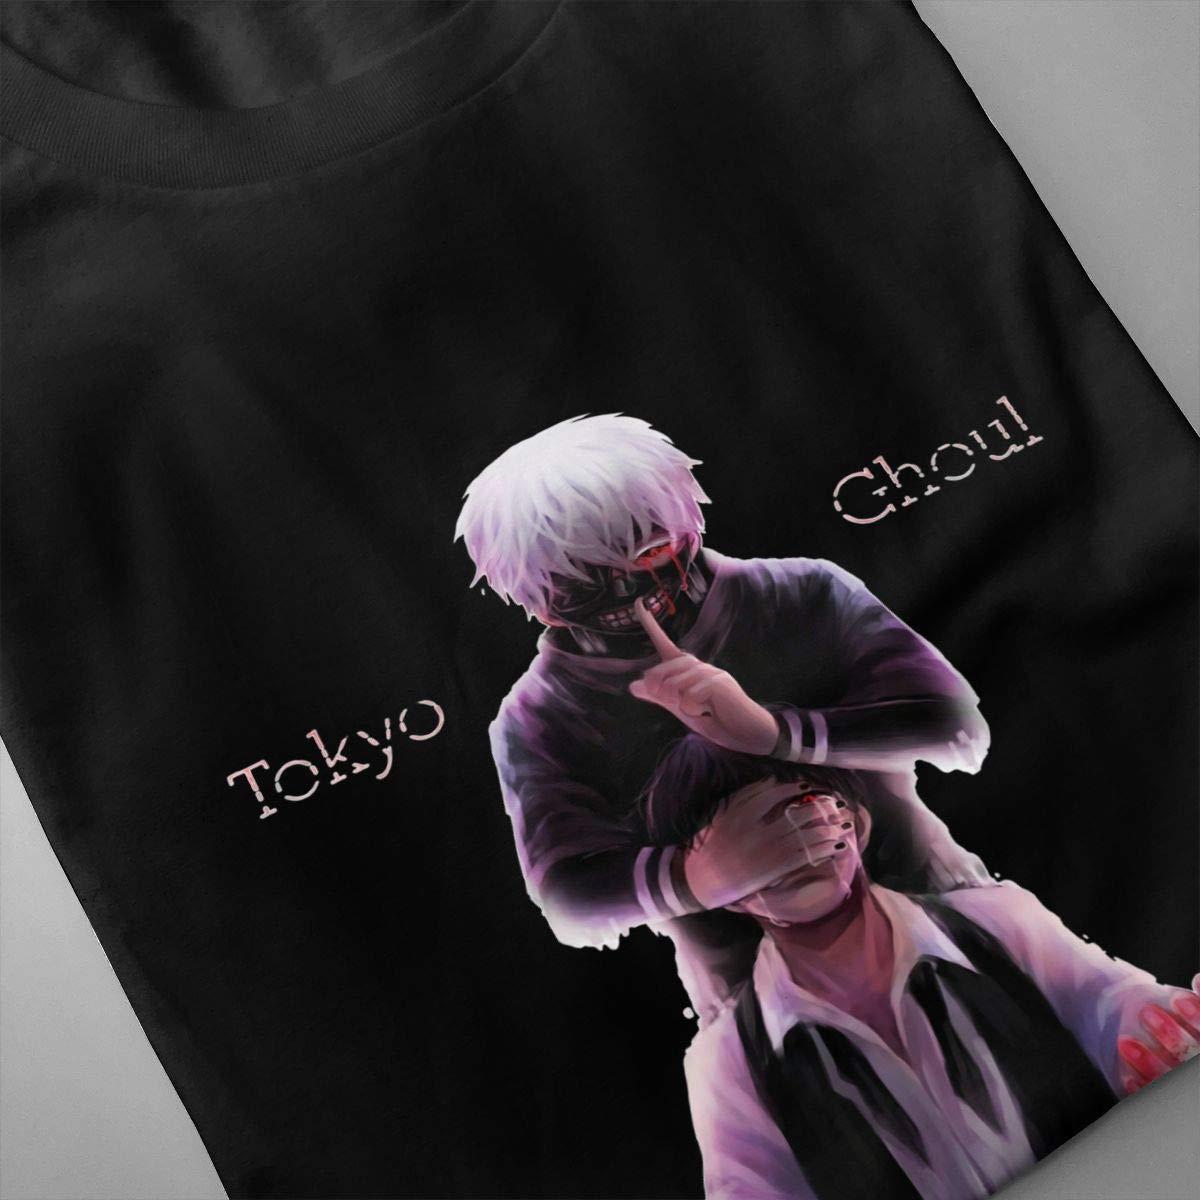 GekhHaon Tokyo Ghoul Mans Pop Short Sleeves T Shirt Tees Black Cotton Short Sleeve Comfy TopsBlack